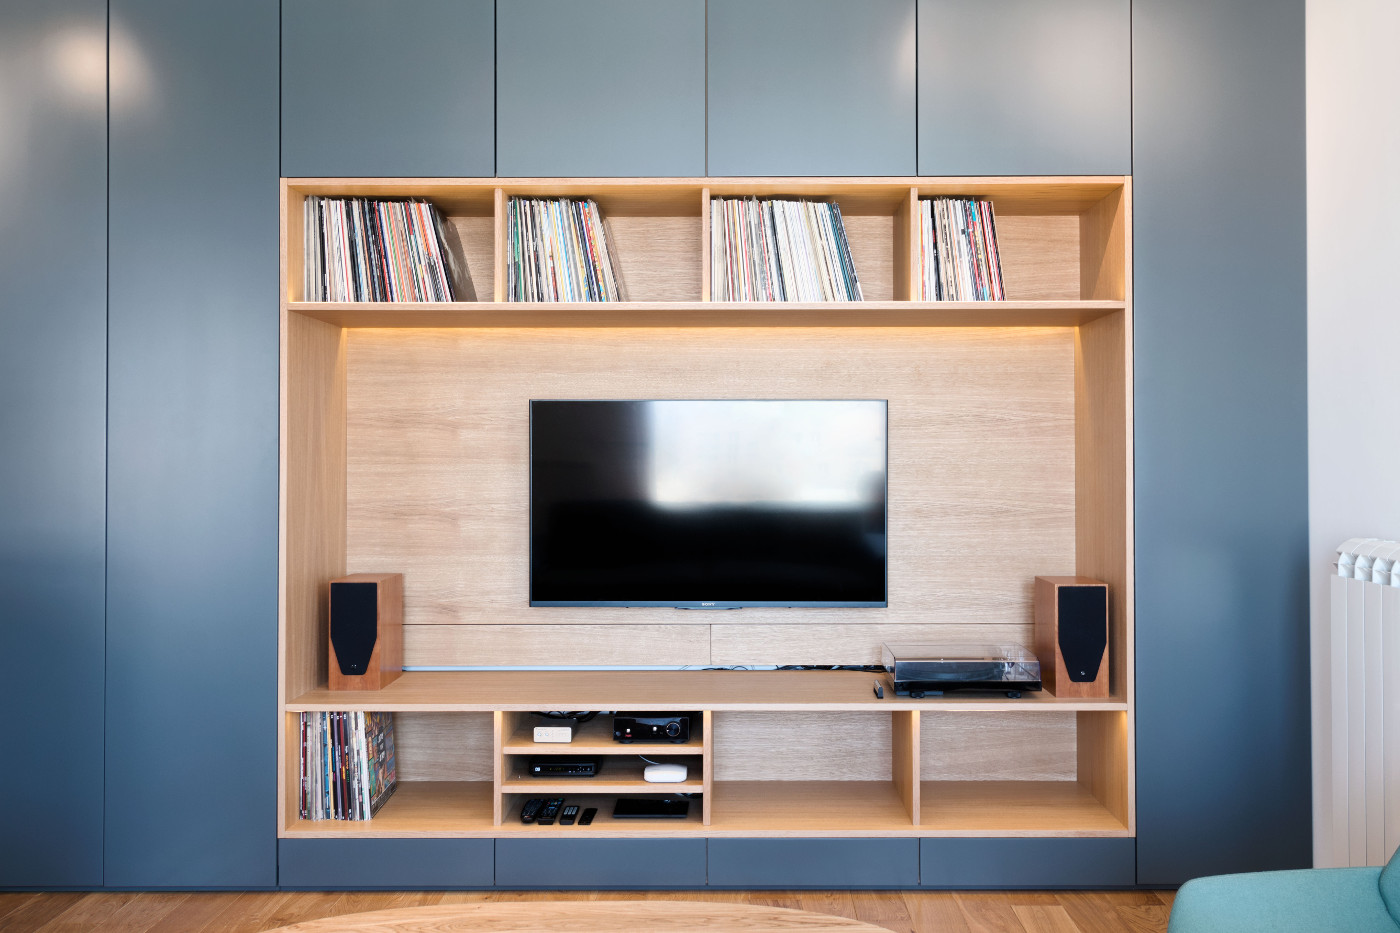 niche apartment – milan stefanovic portfolio